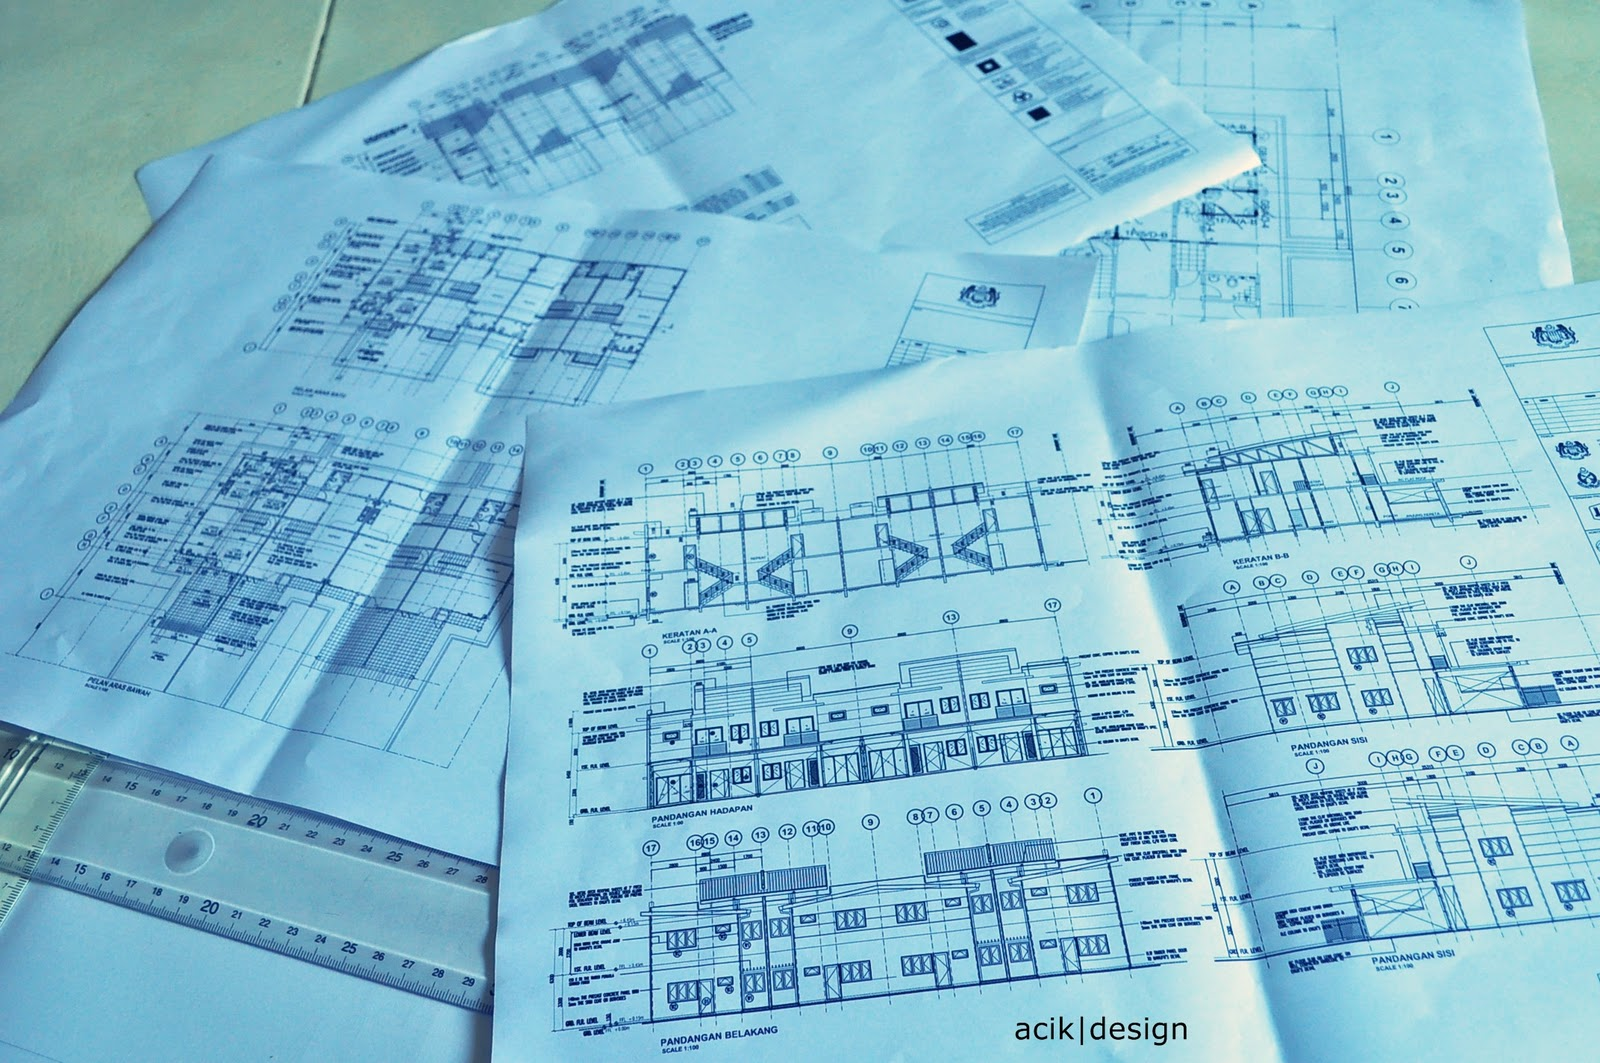 Acik aidil in da house engineering drawing part1 for Plan arkitek